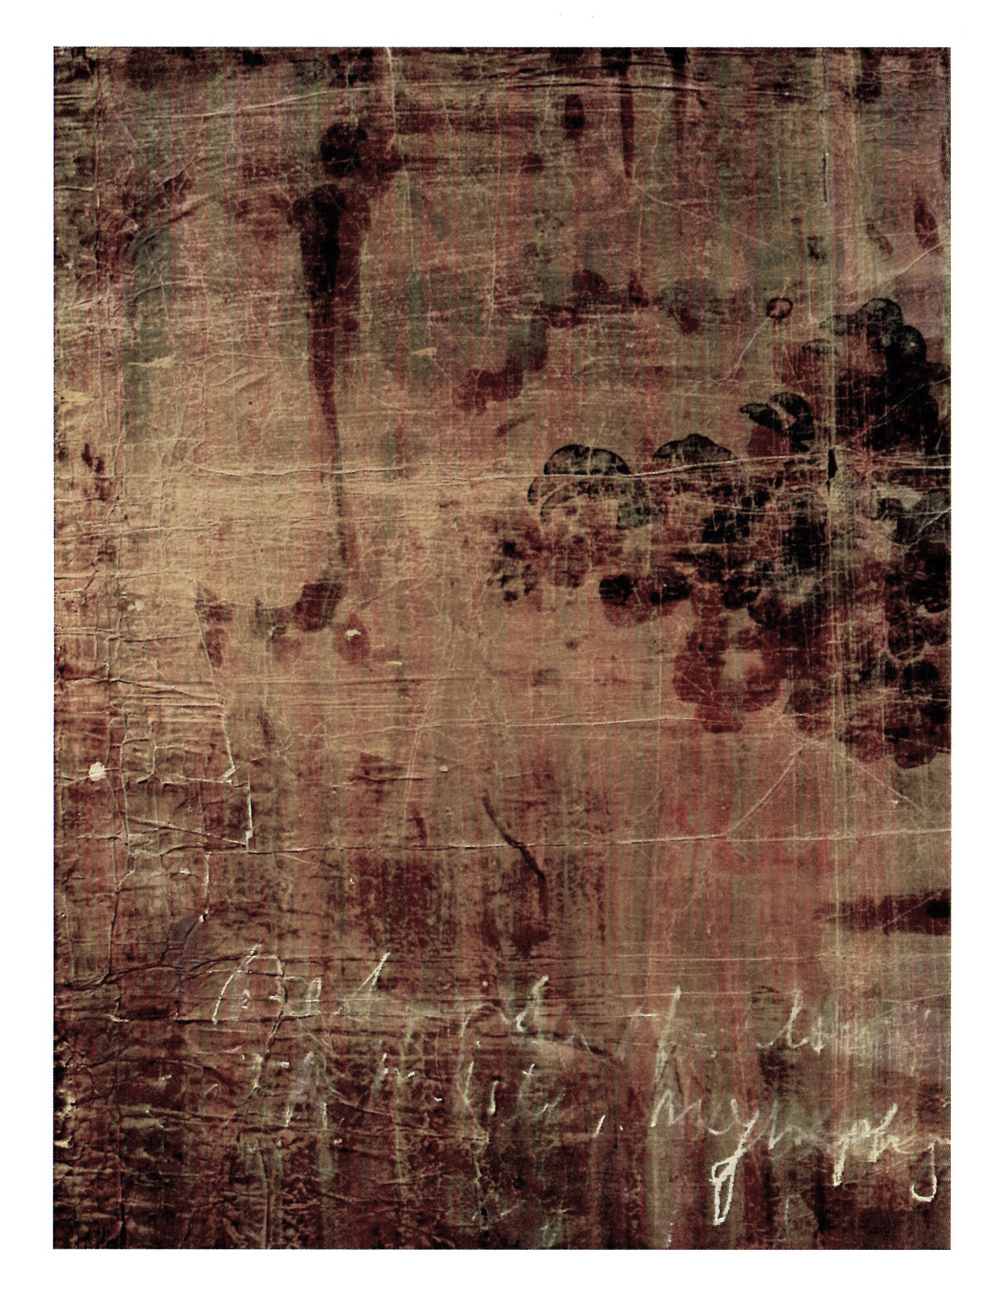 Luca Caccioni, Behind the cloack of mist. nymphs, 2016, pigmenti, abrasione su carta e tela su dibond, cm 108x80,5